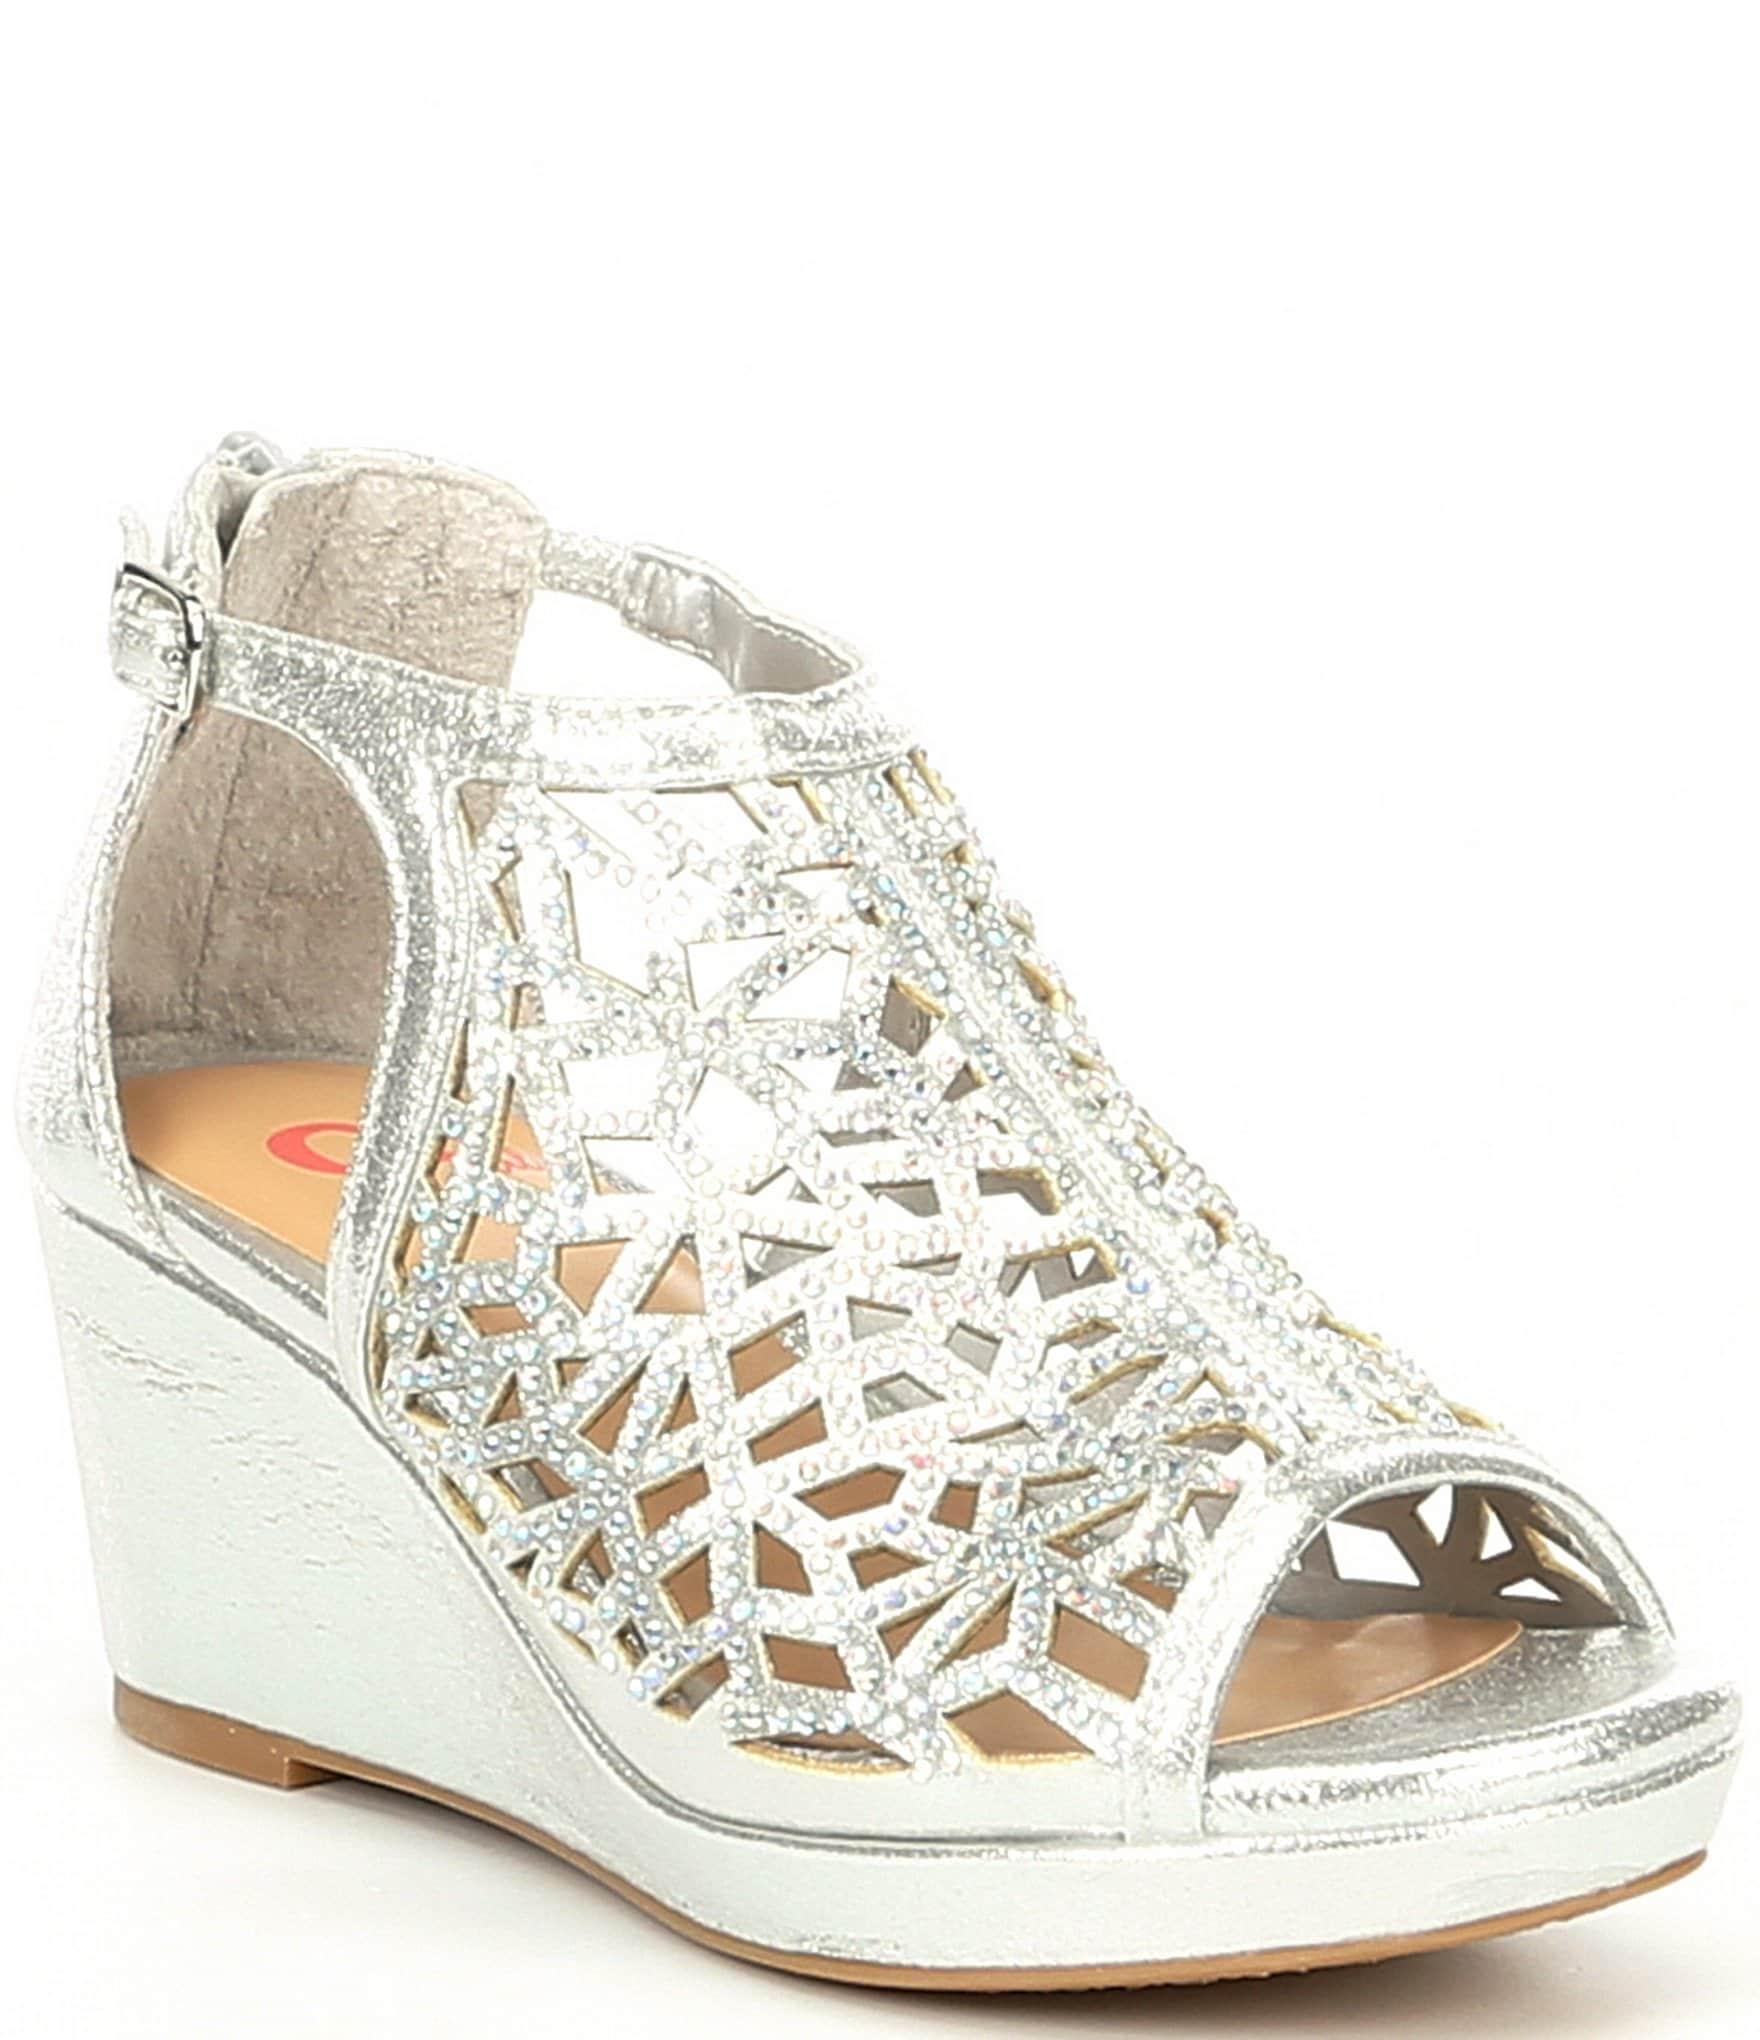 GB Youth Girls' Shoes | Dillard's